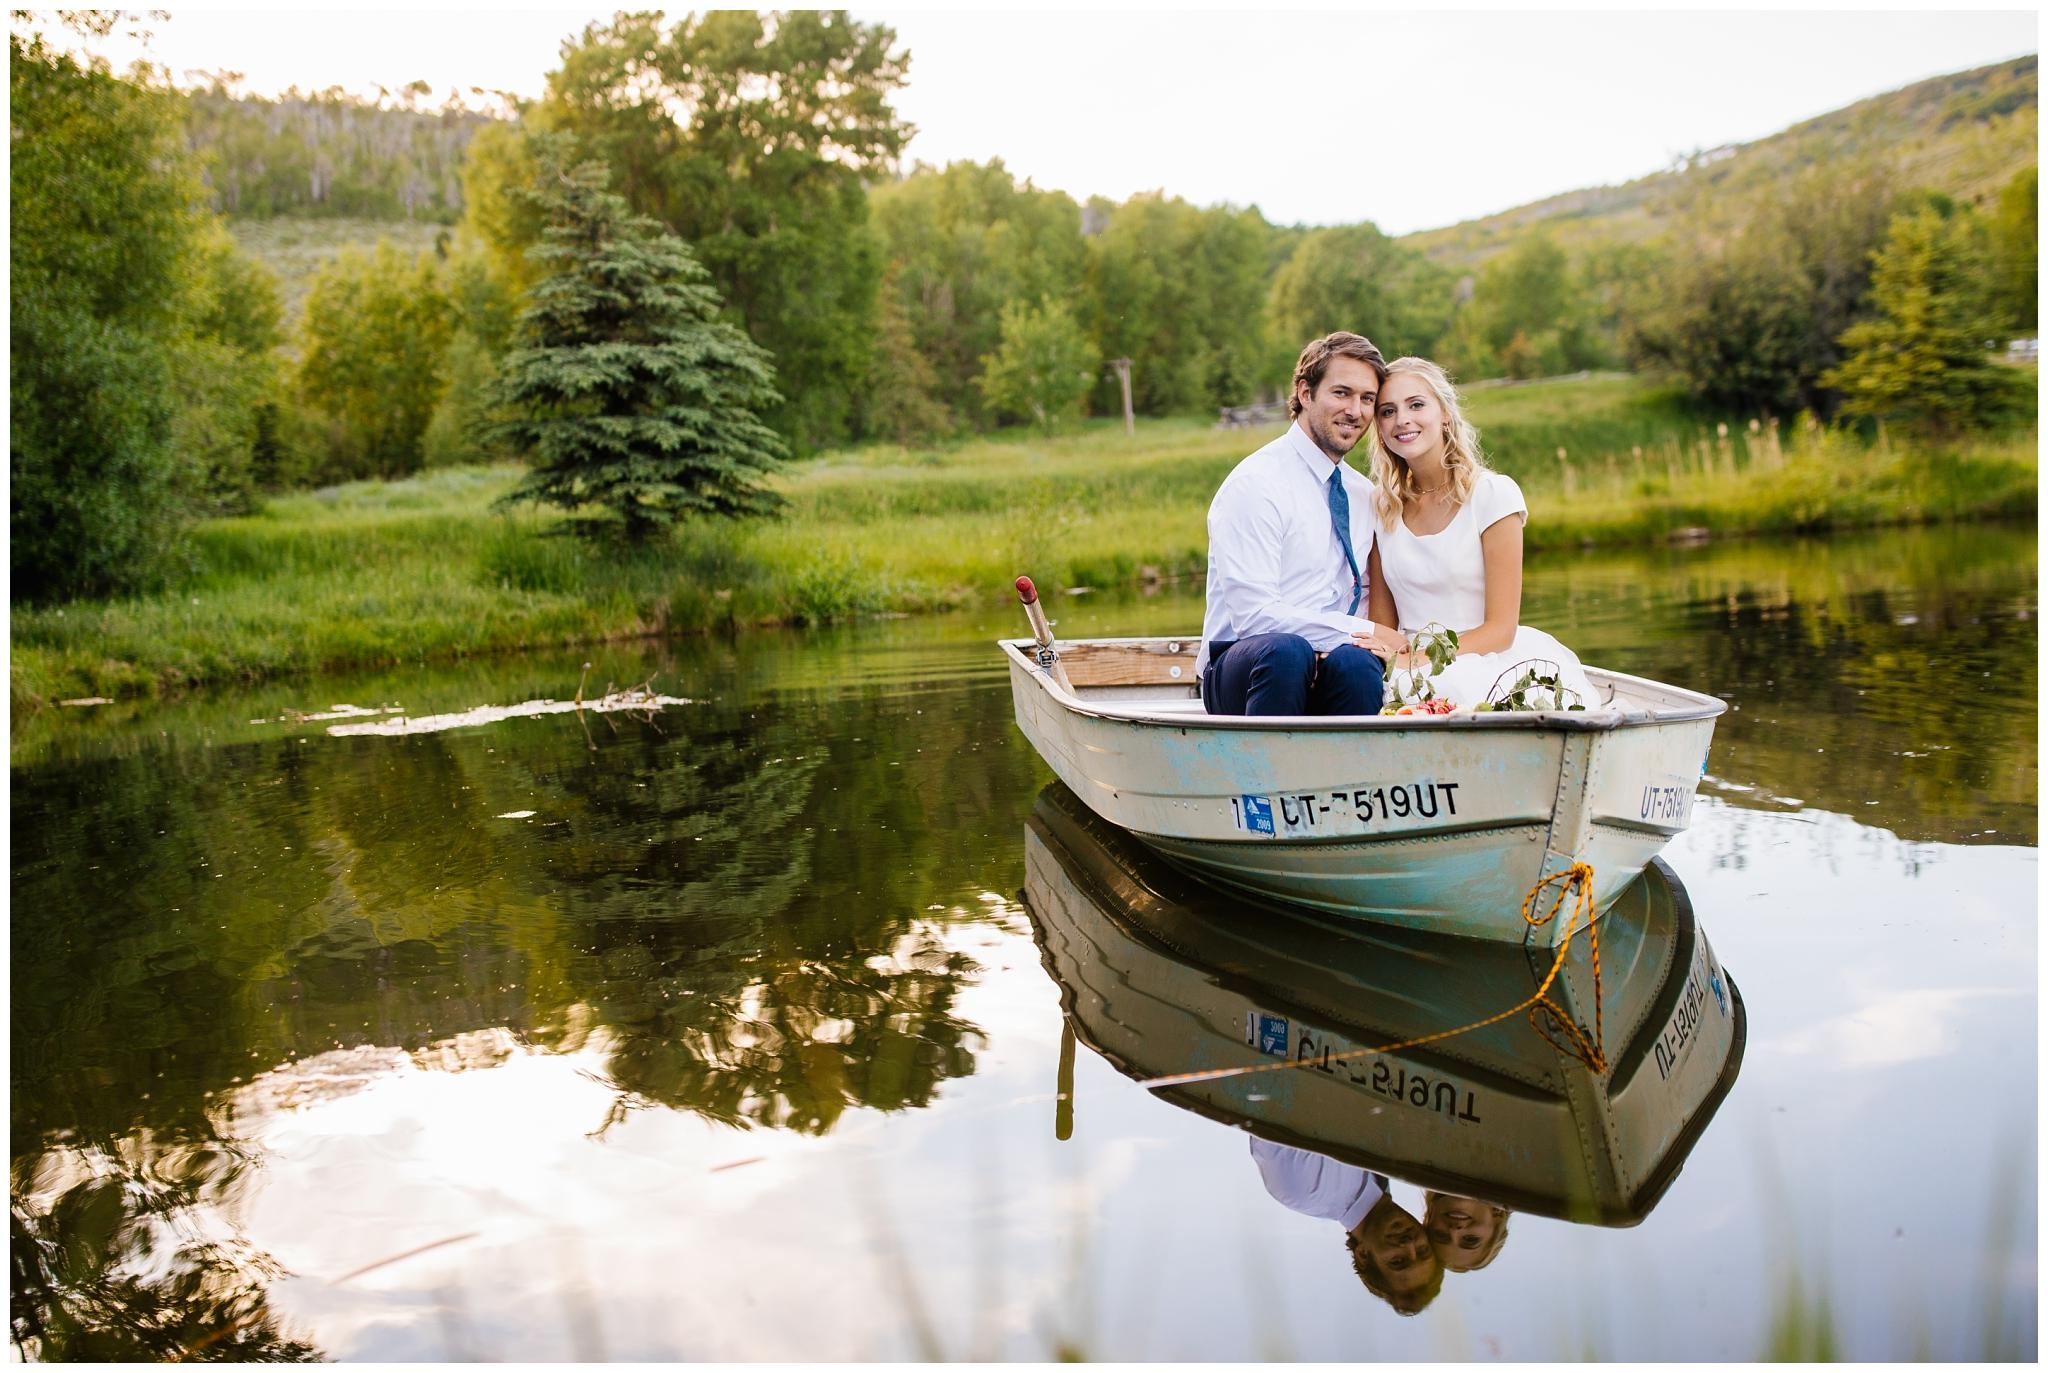 Lizzie-B-Imagery-Utah-Wedding-Photographer-Park-City-Photographer_0046.jpg